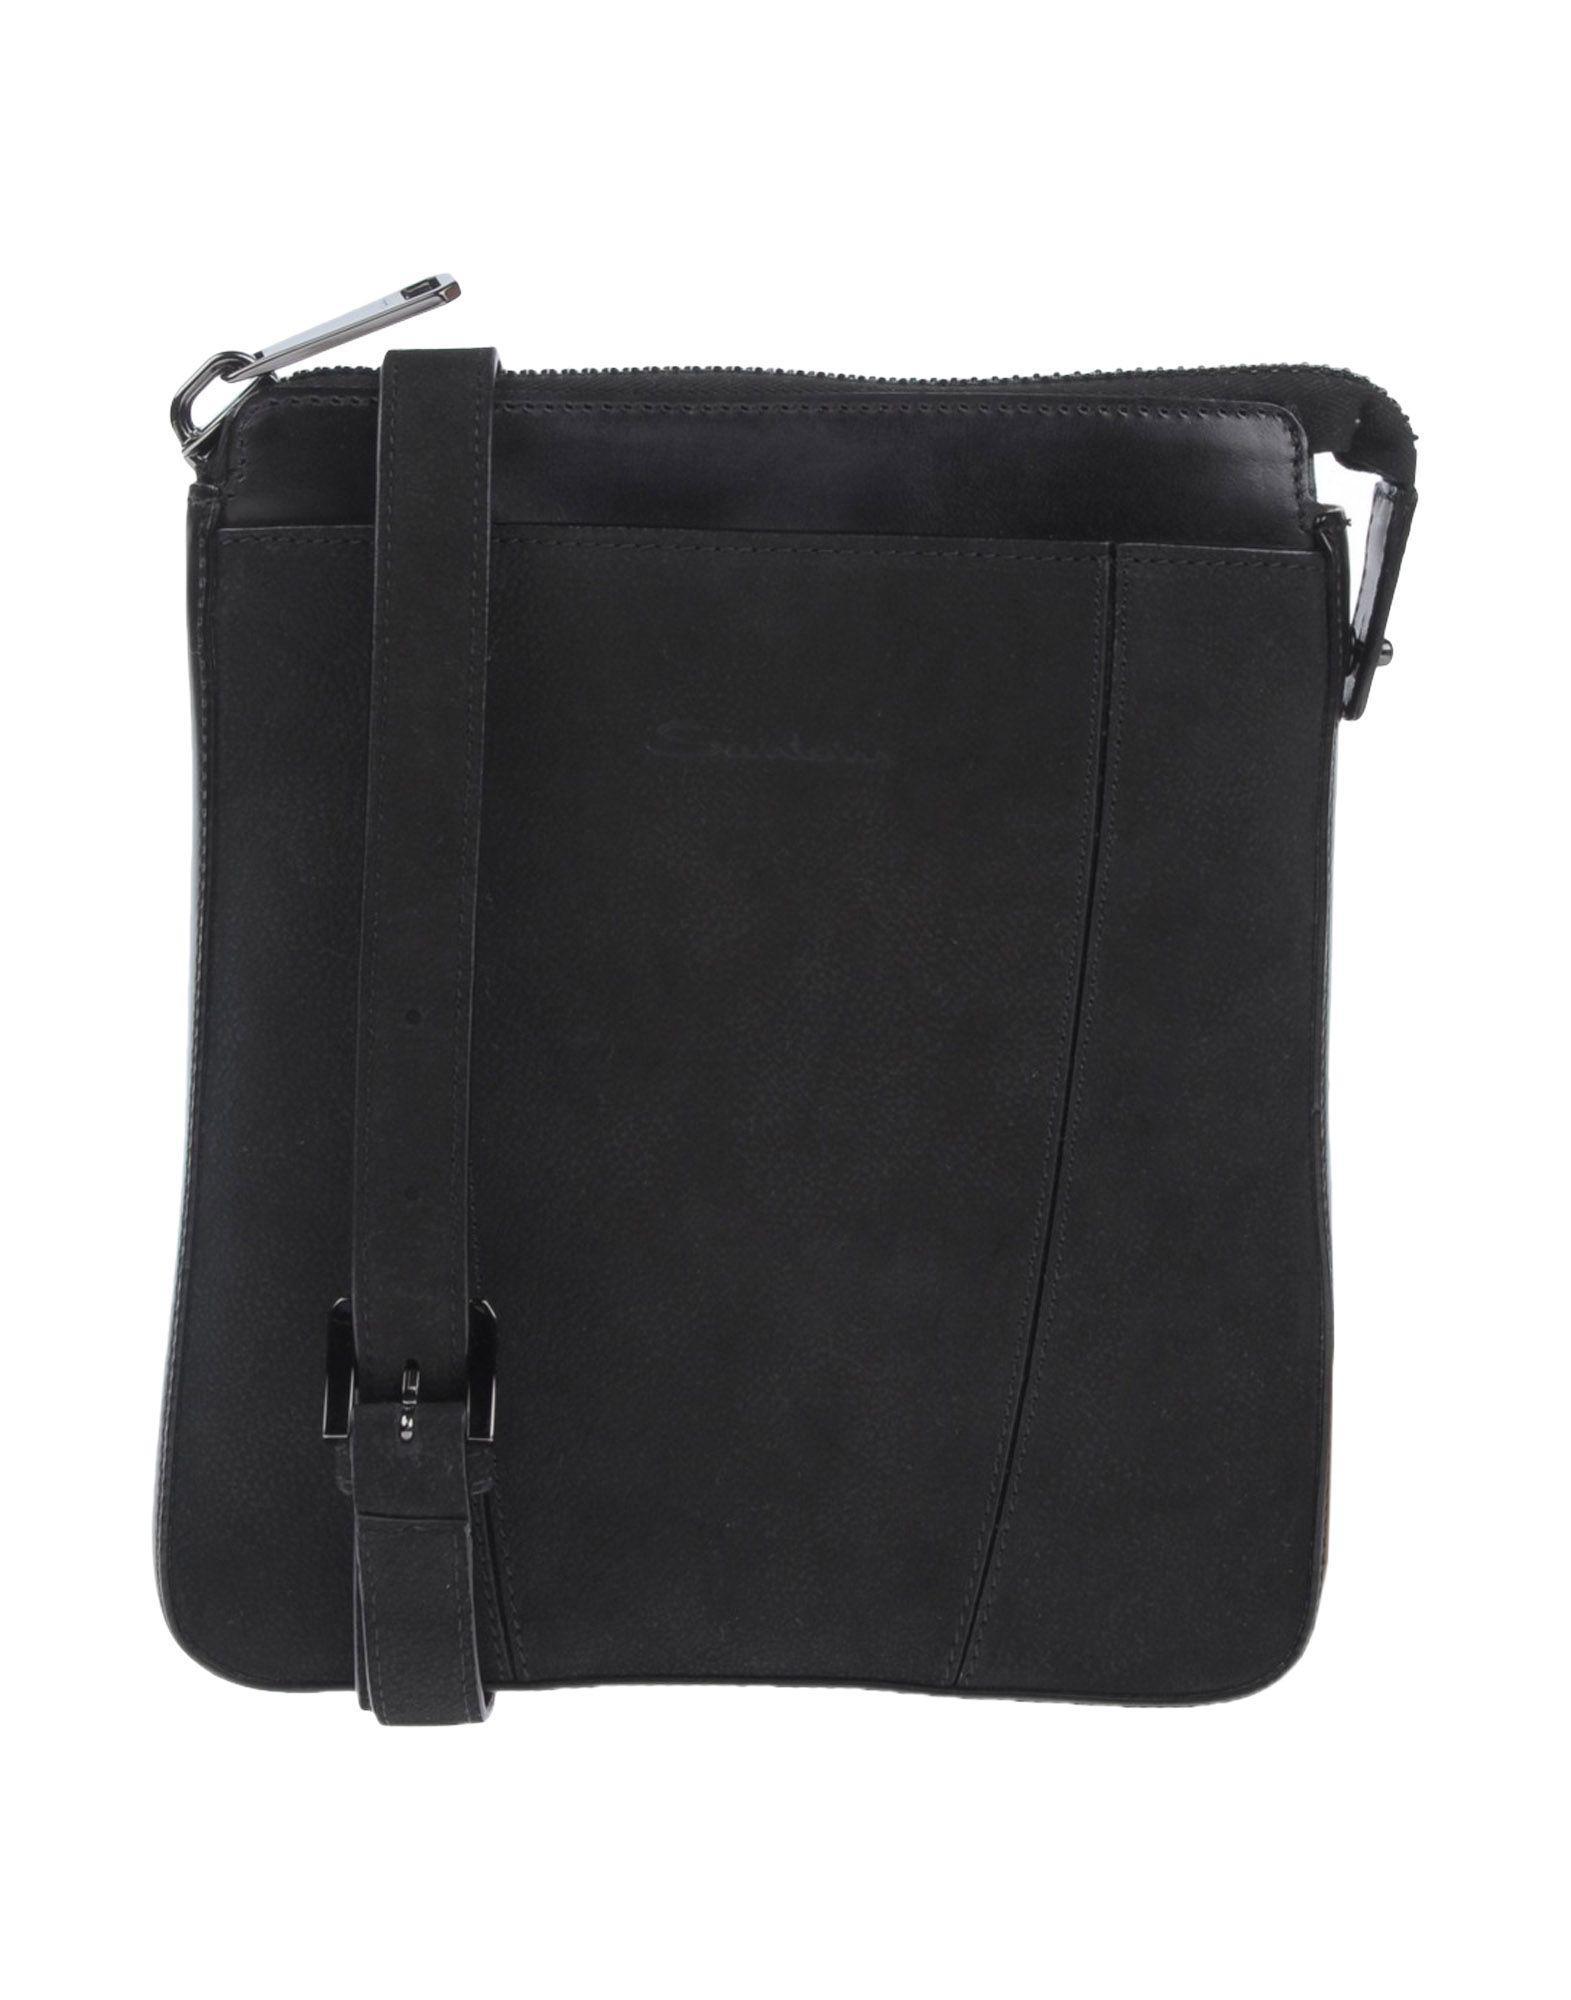 BAGS - Cross-body bags Santoni I4Y4gkm